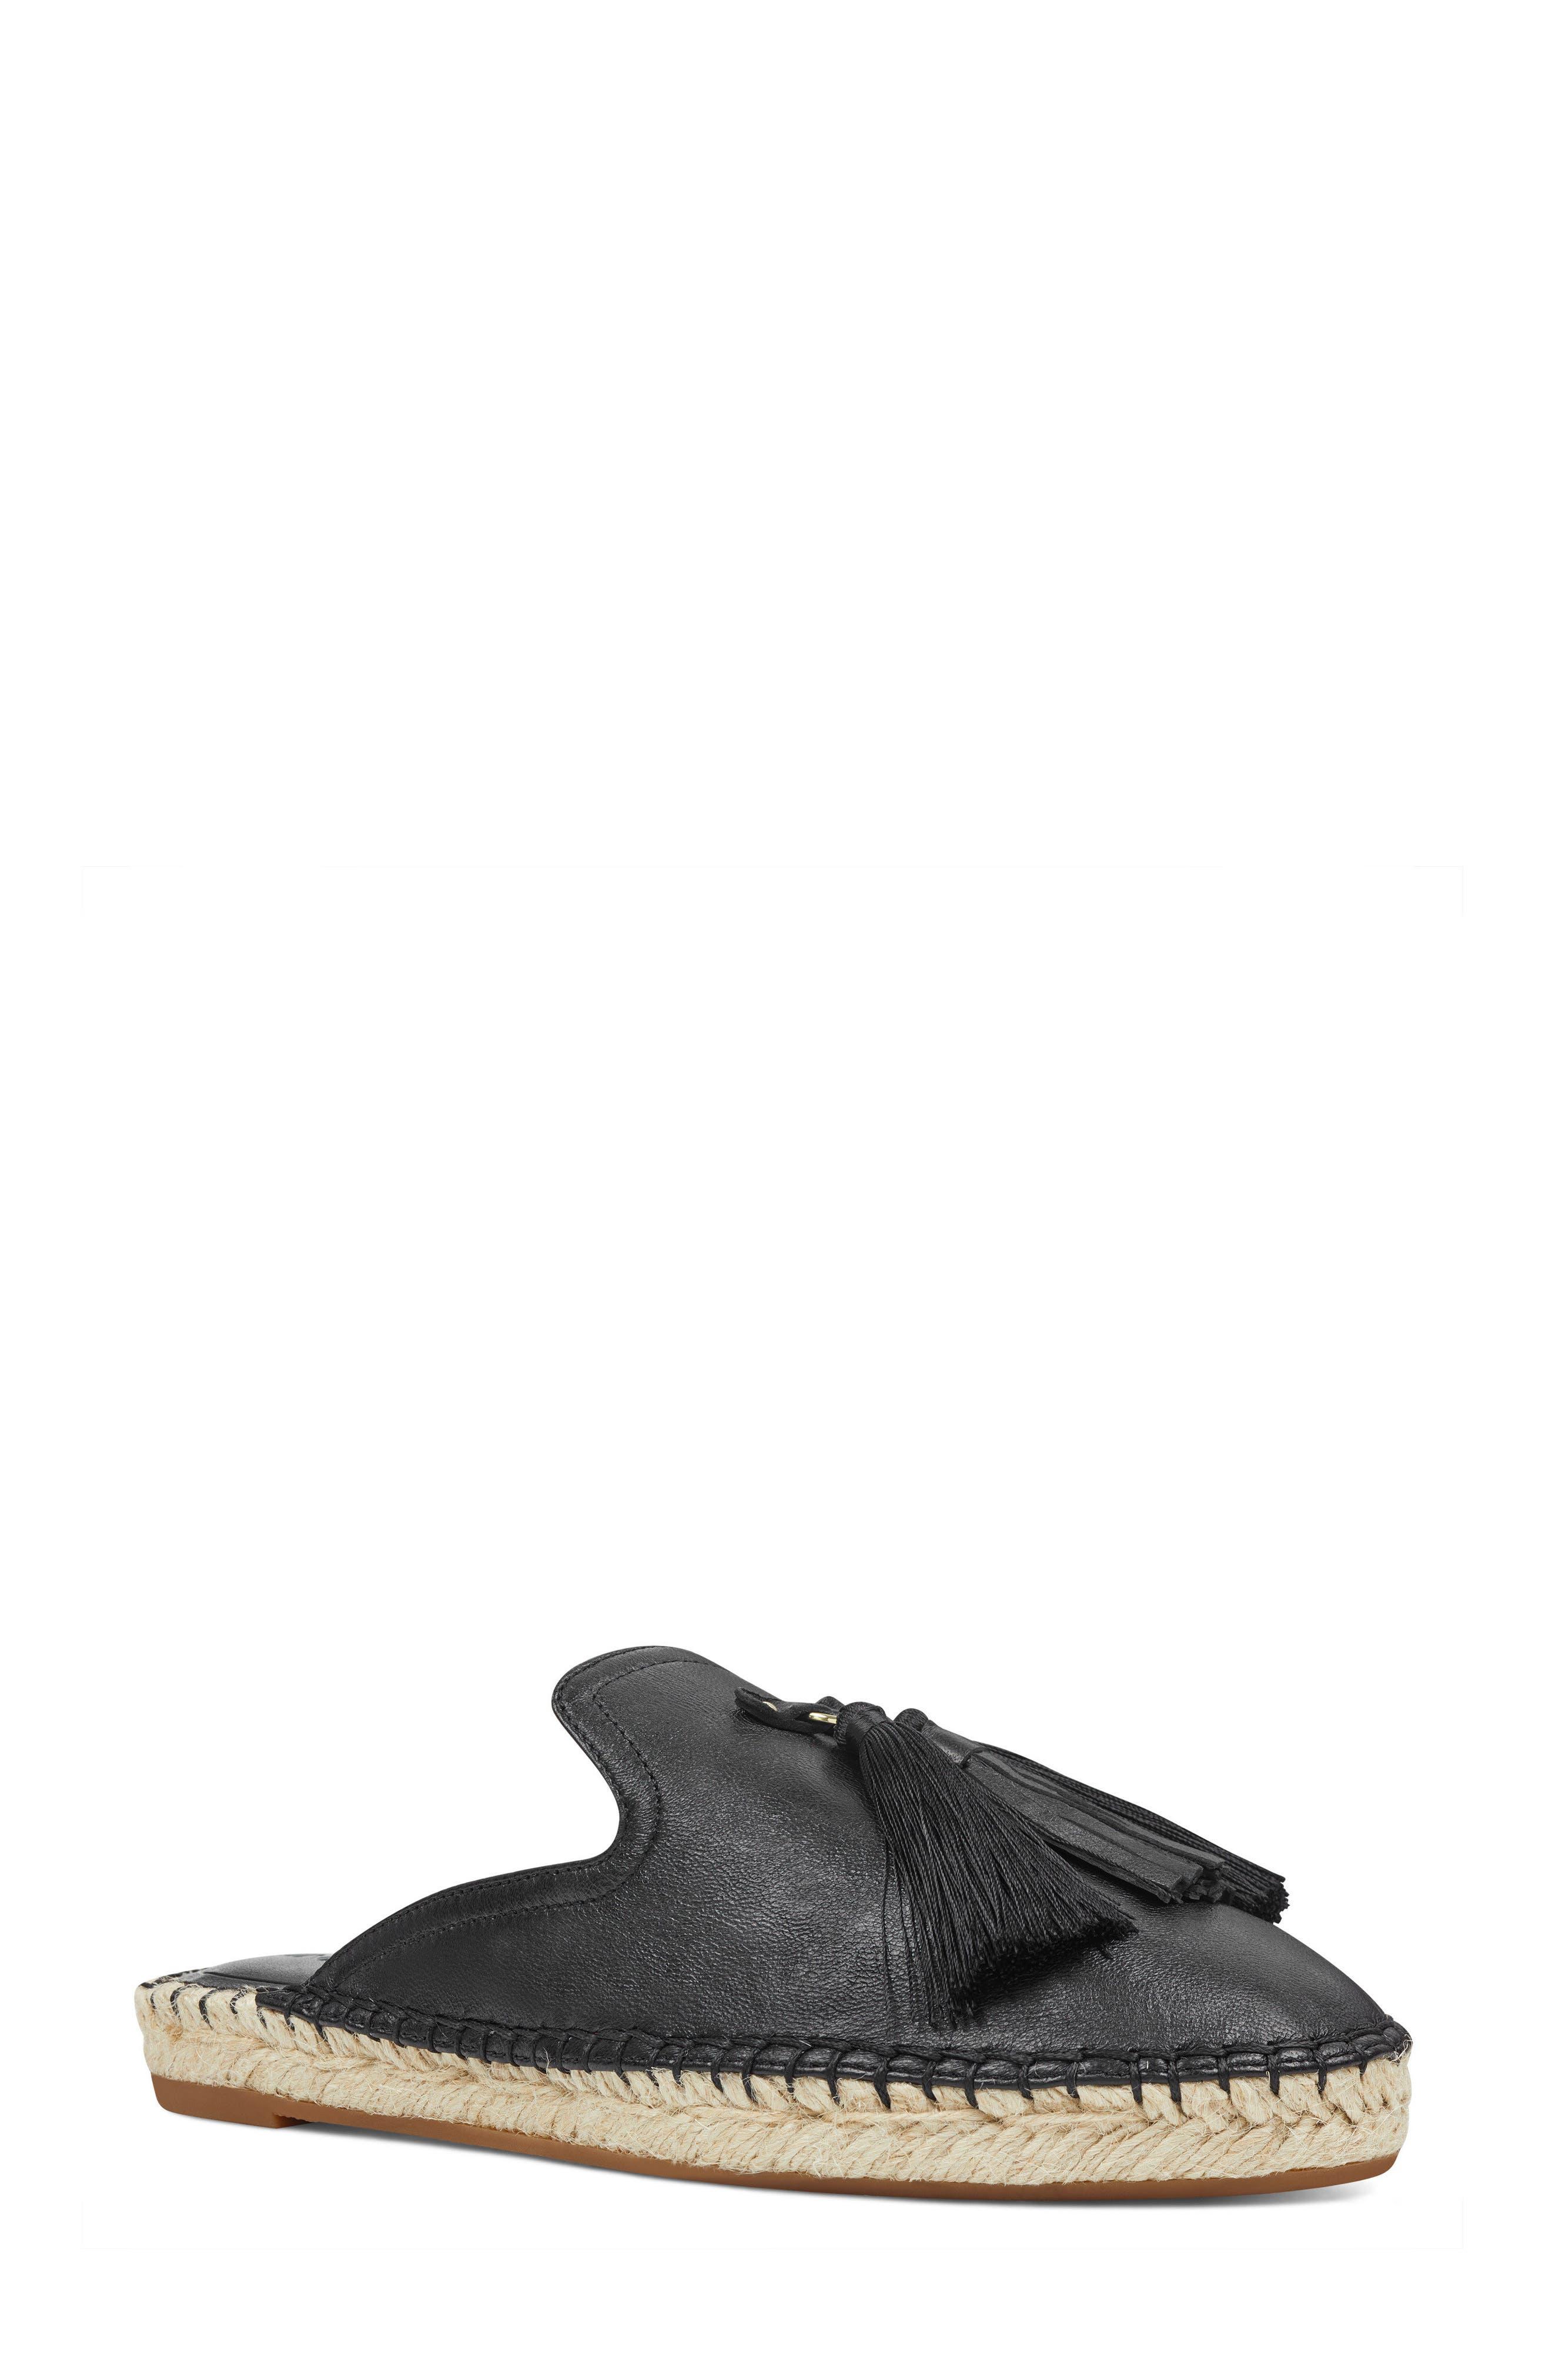 Val Tasseled Loafer Mule,                             Main thumbnail 1, color,                             001